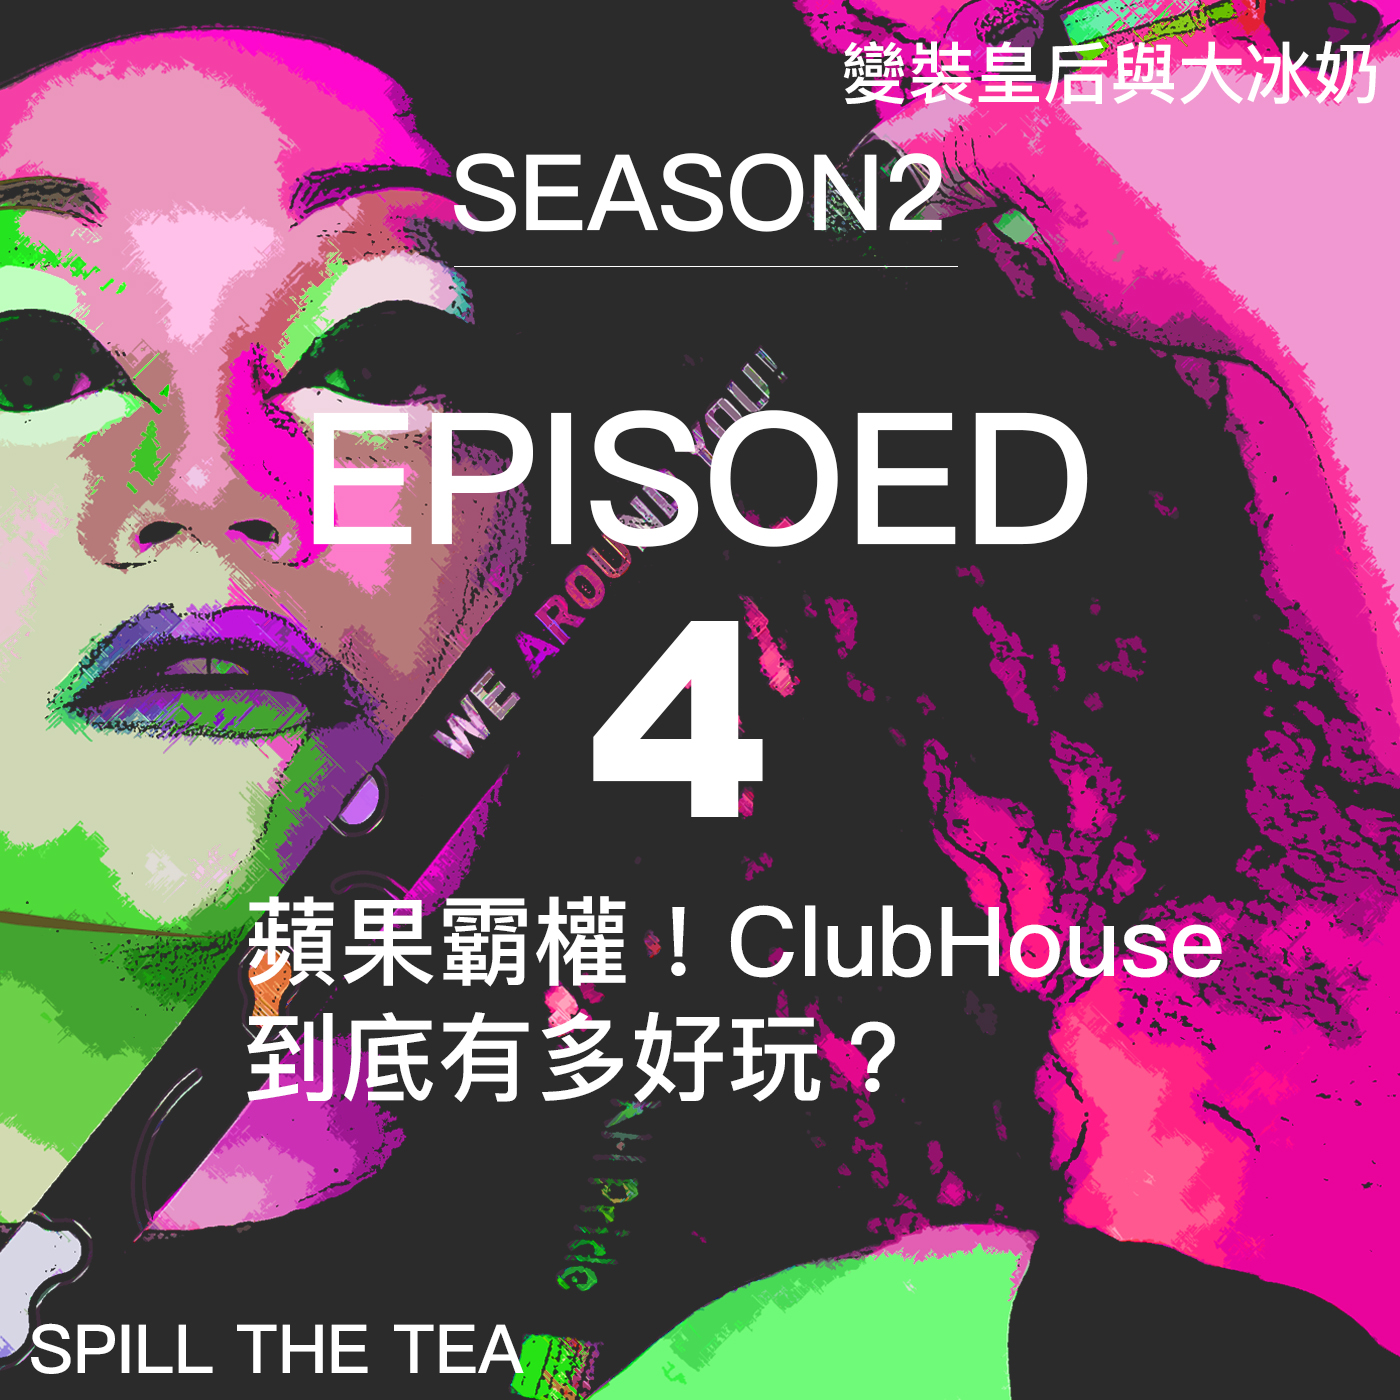 S2EP4:蘋果霸權!ClubHouse到底有多好玩,開車、政治樣樣來毫無限制。(下)